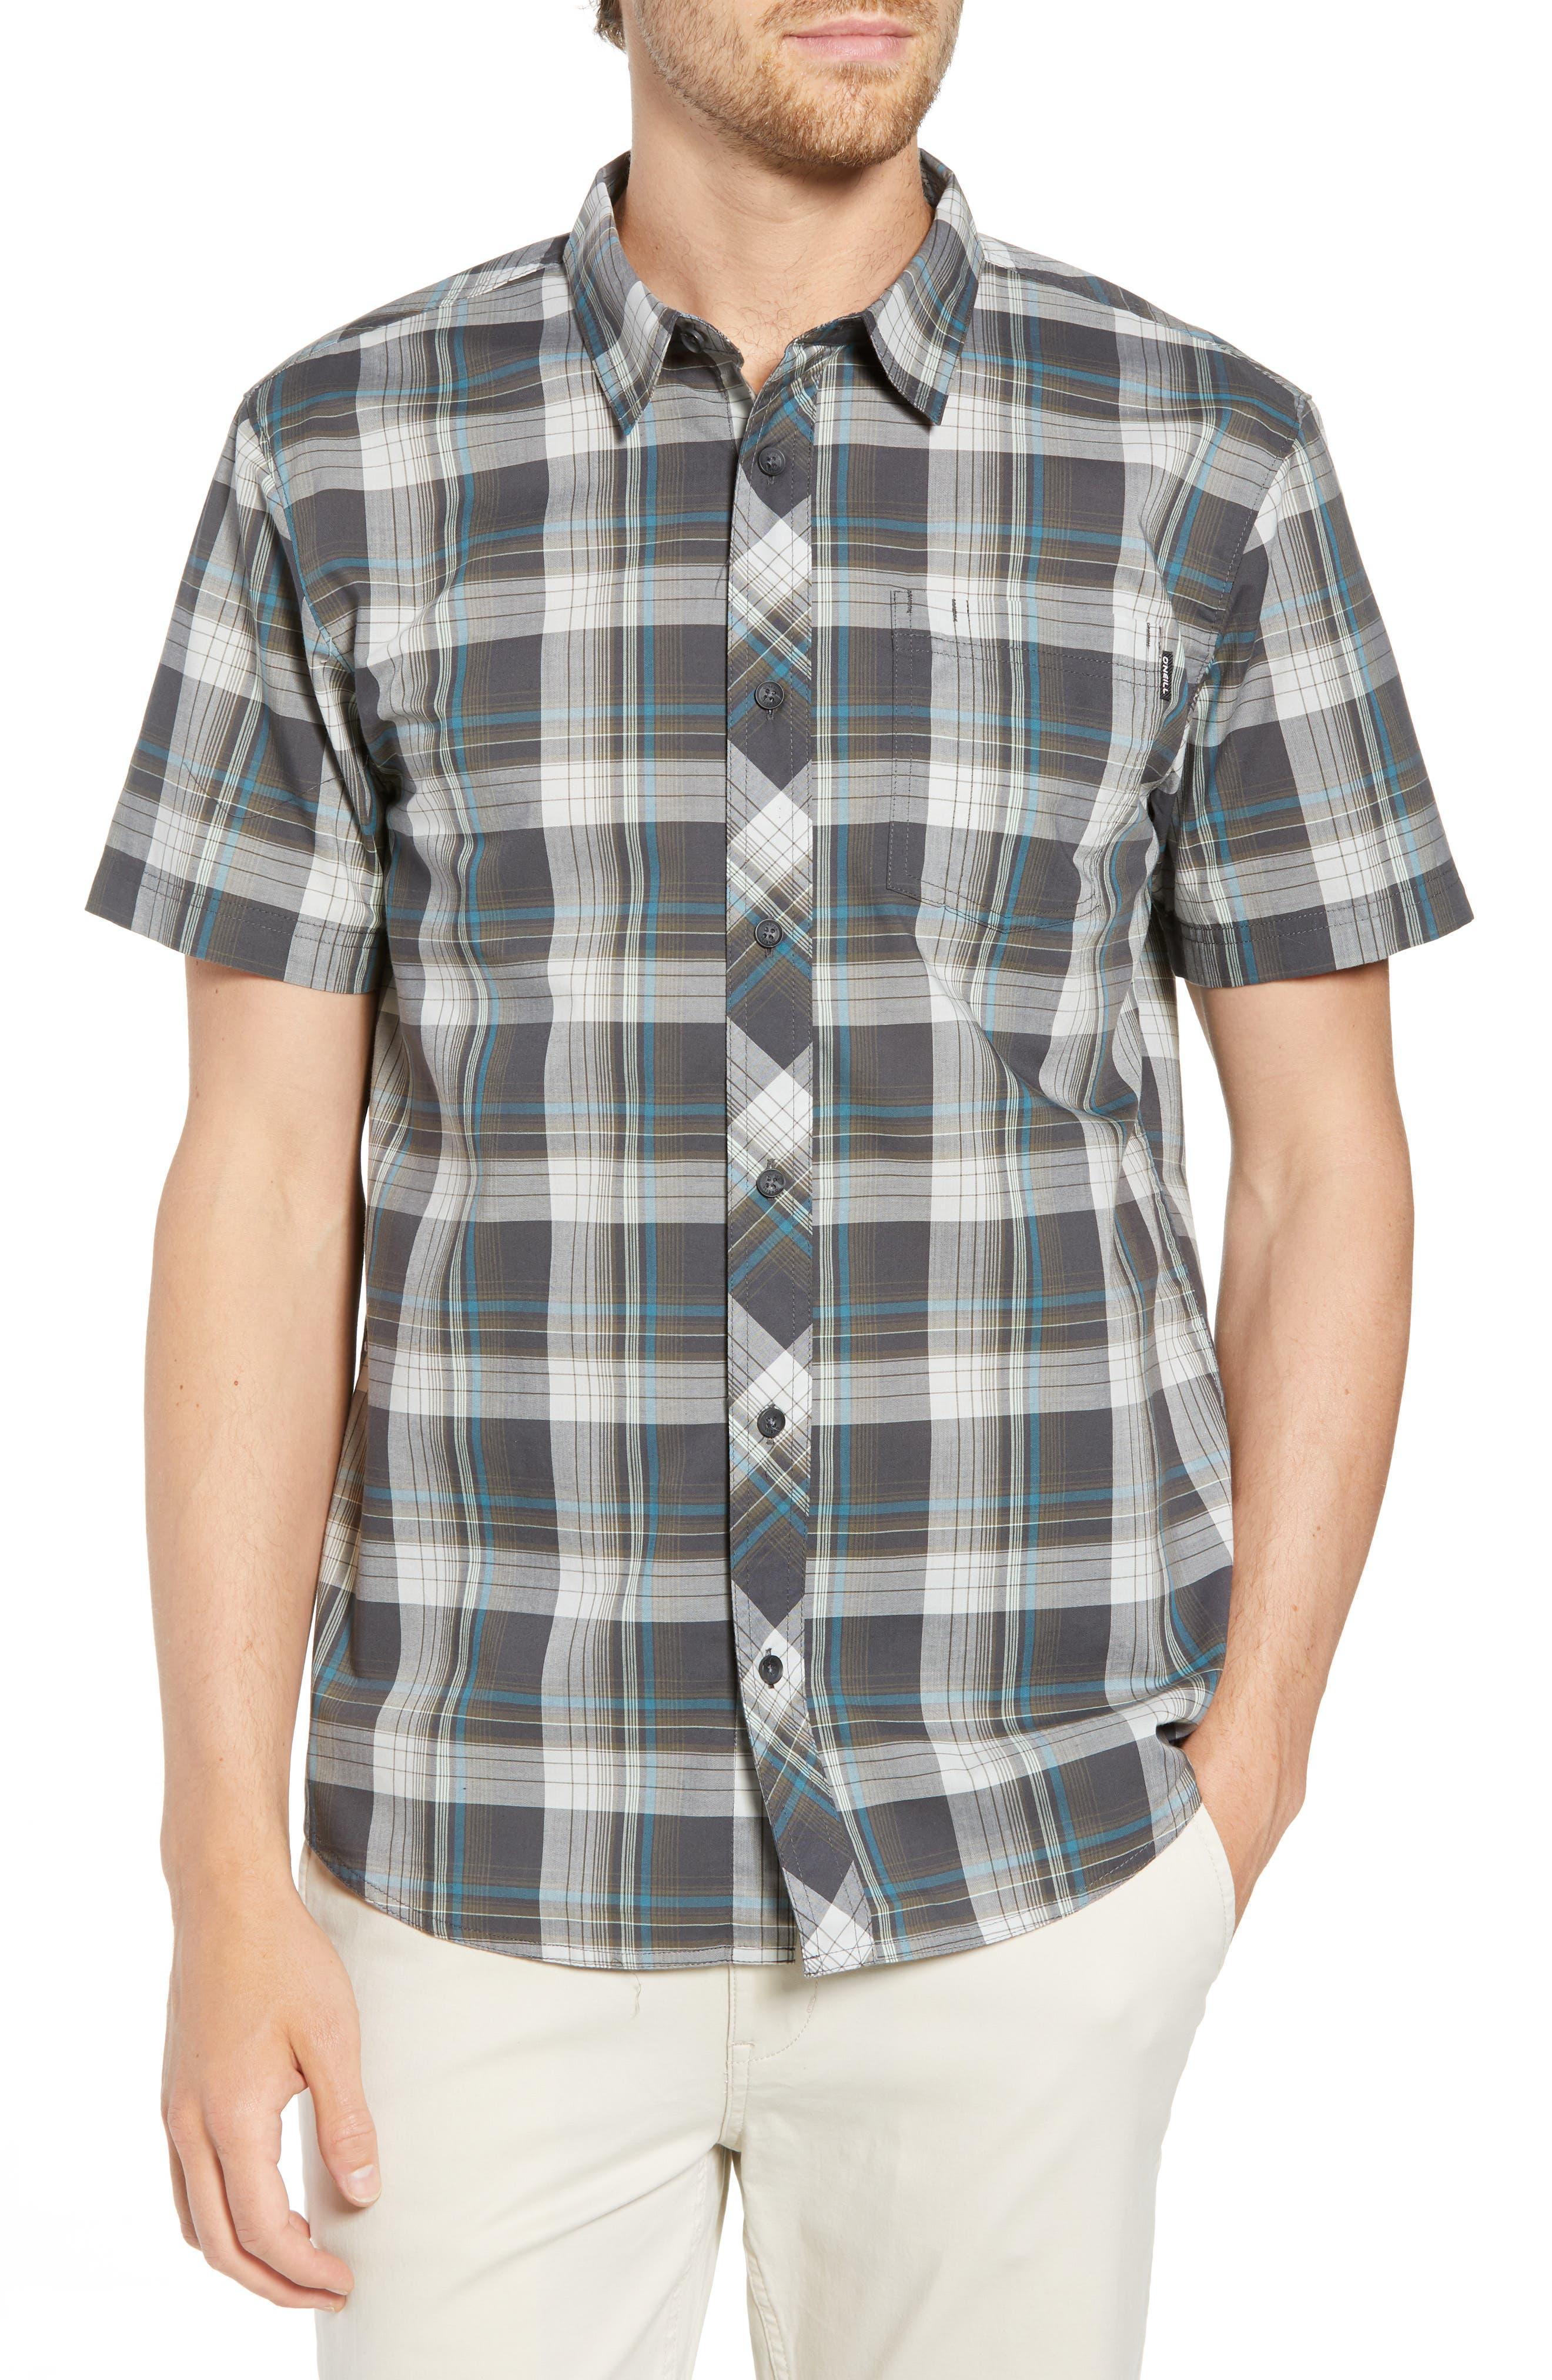 Gentry Short Sleeve Shirt,                             Main thumbnail 1, color,                             Asphalt